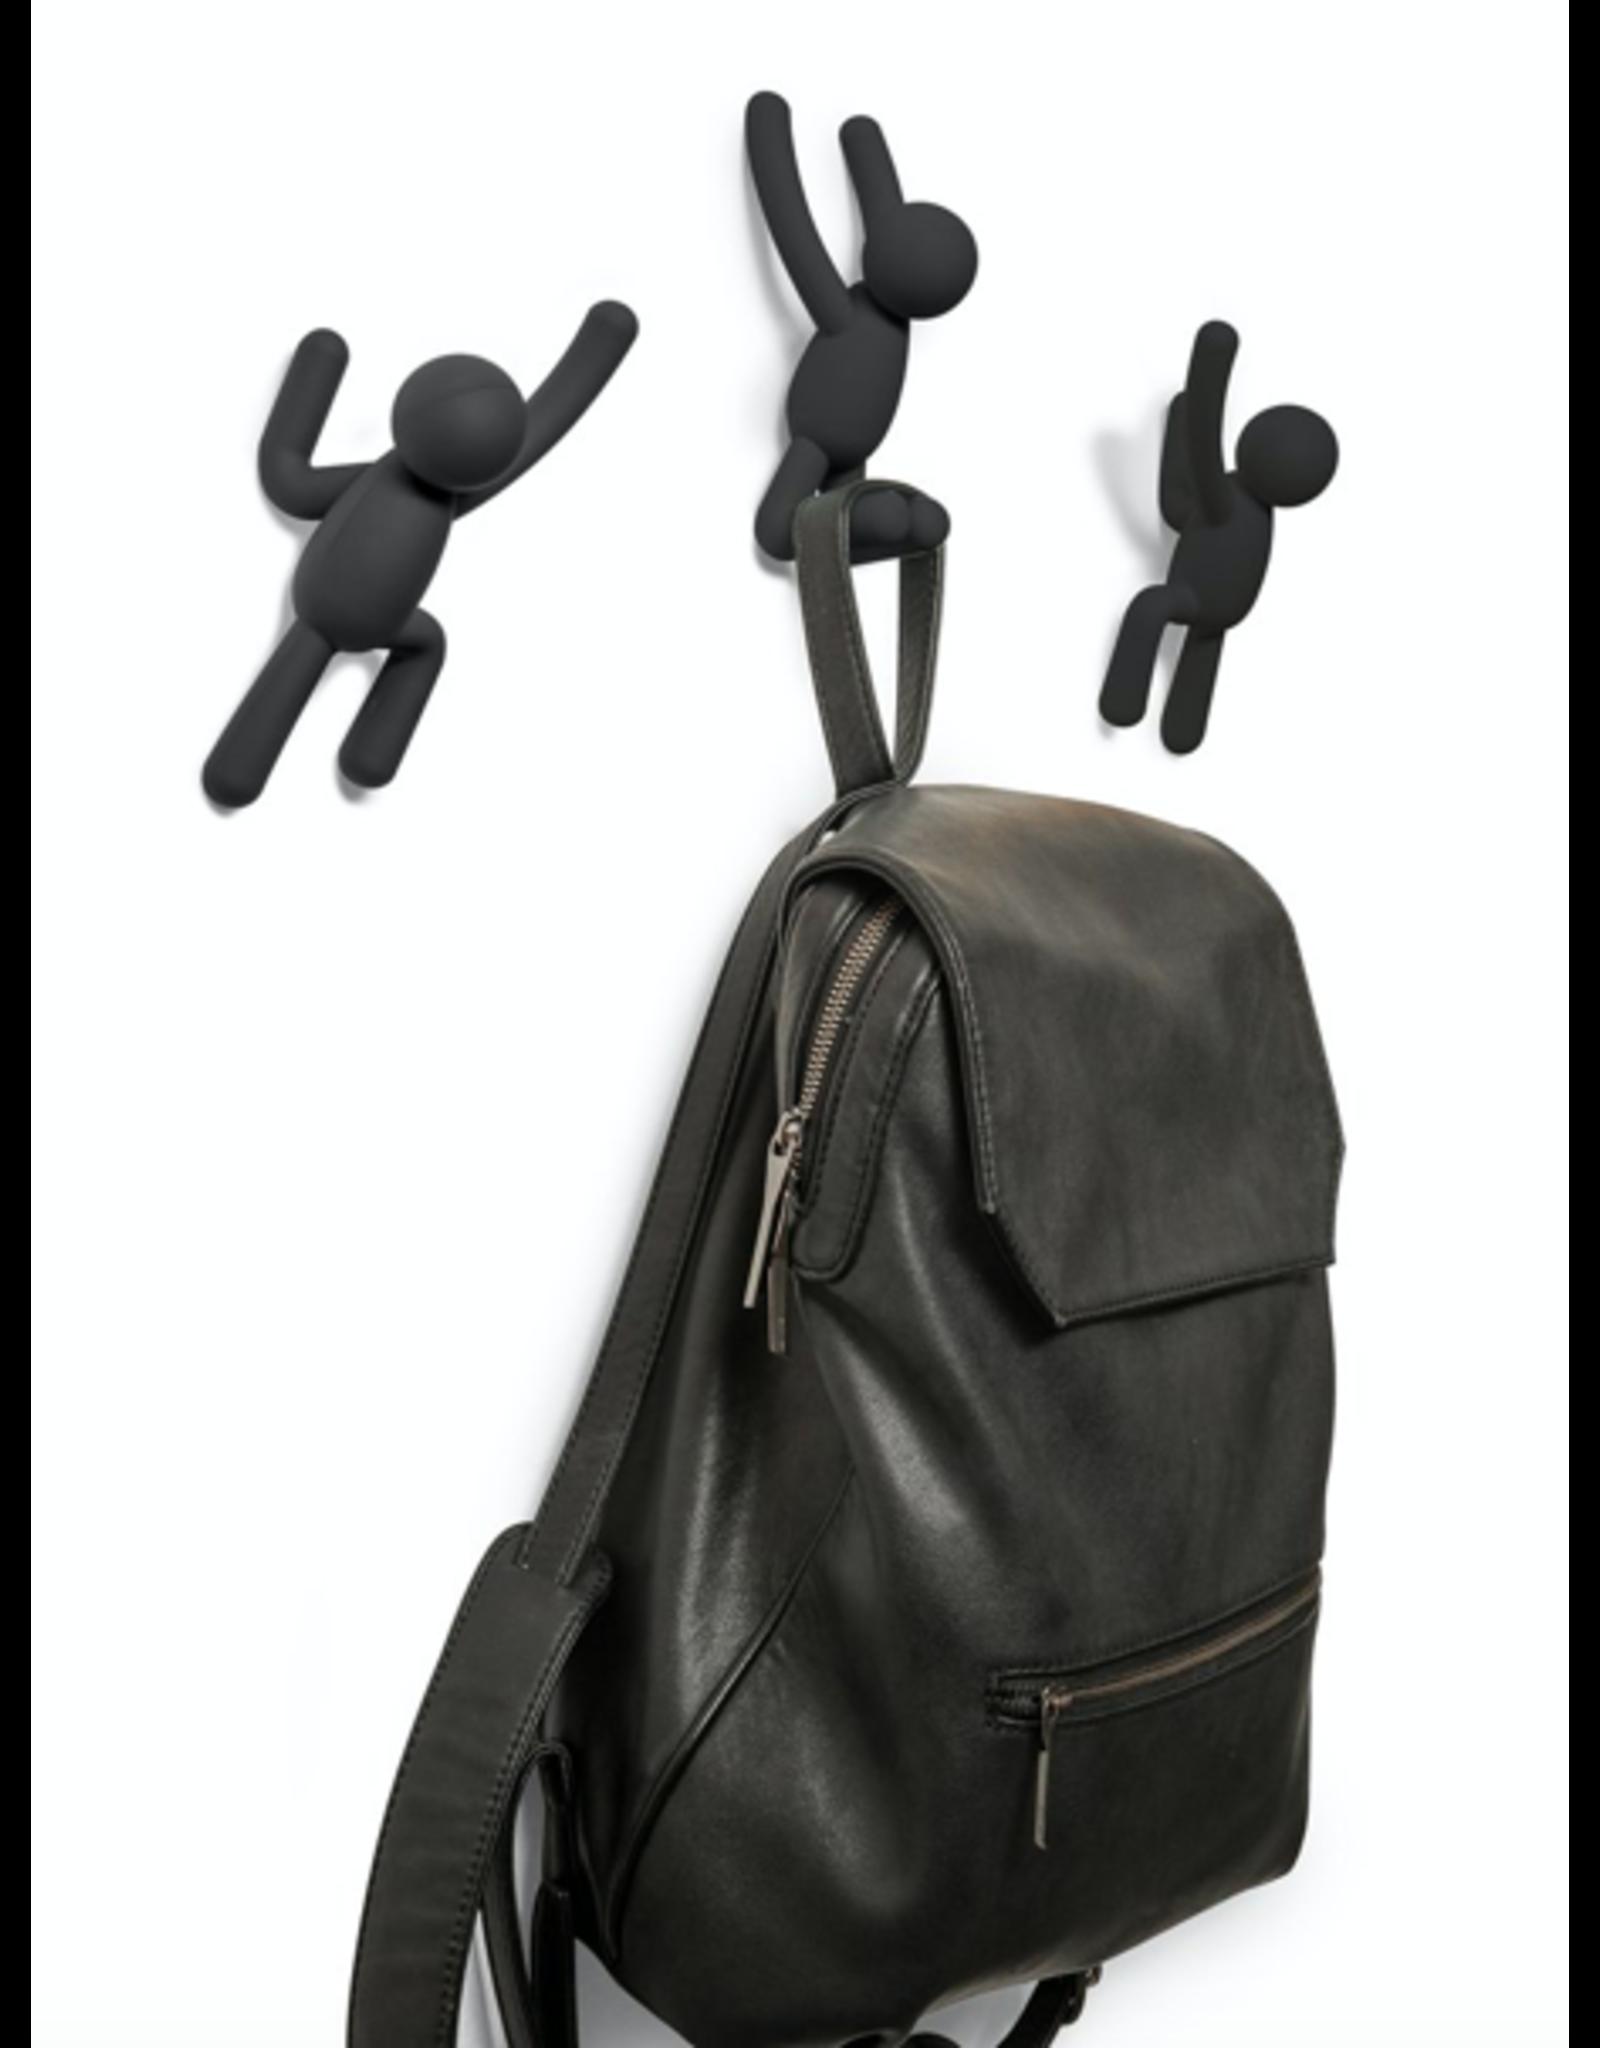 Umbra hooks - buddy (black)